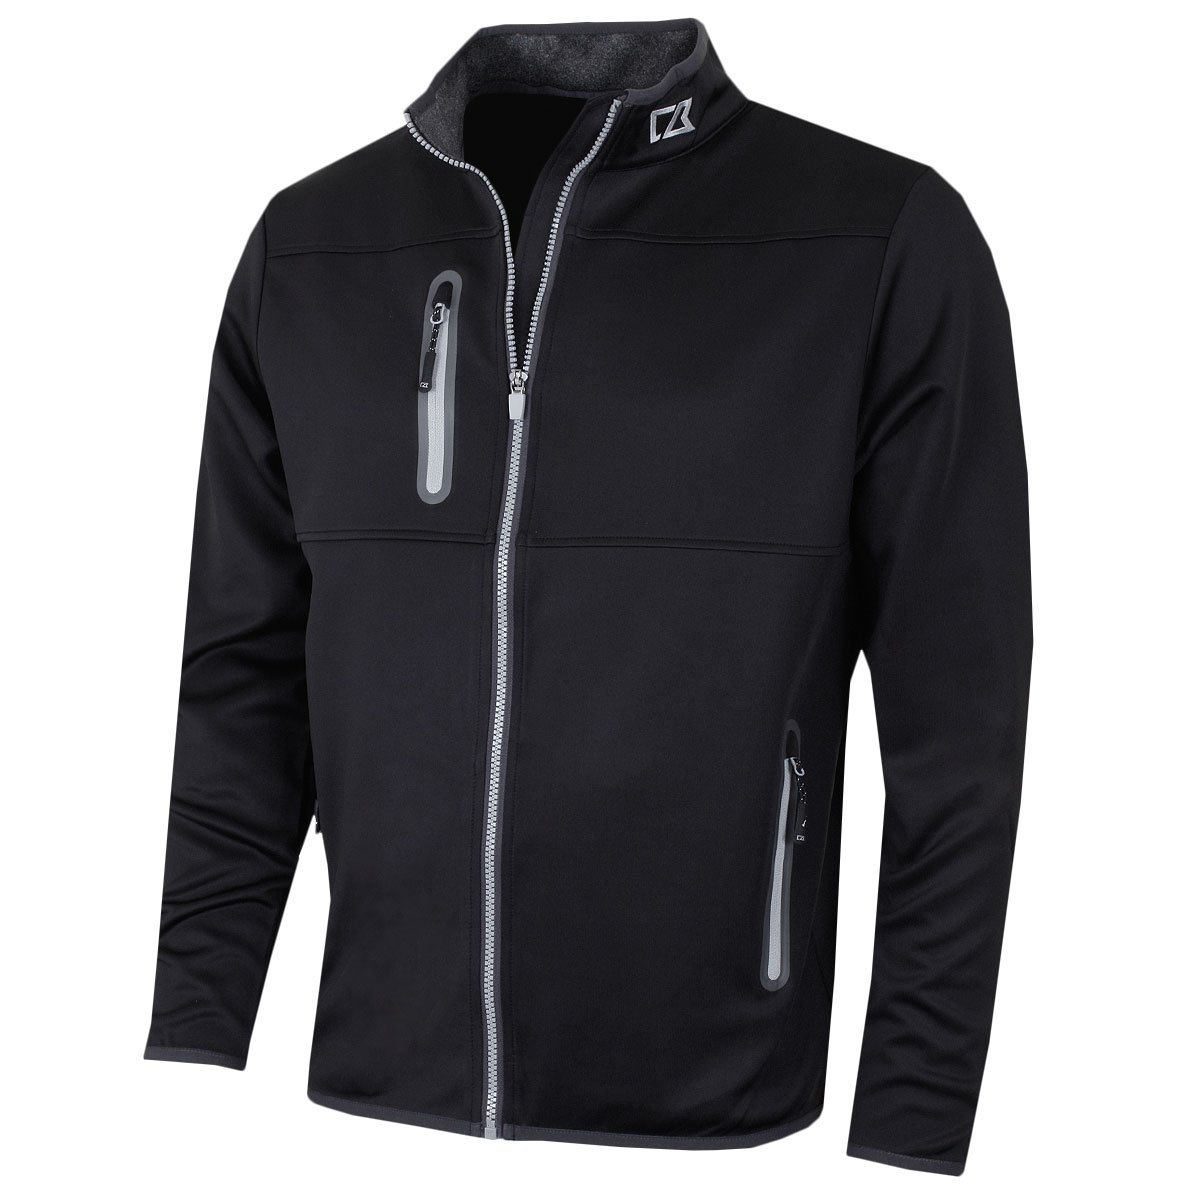 61341f56917 Amazon.com : Cutter & Buck 2017 Mens Water Resistant Montana Full Zip  Performance Golf Jacket : Clothing